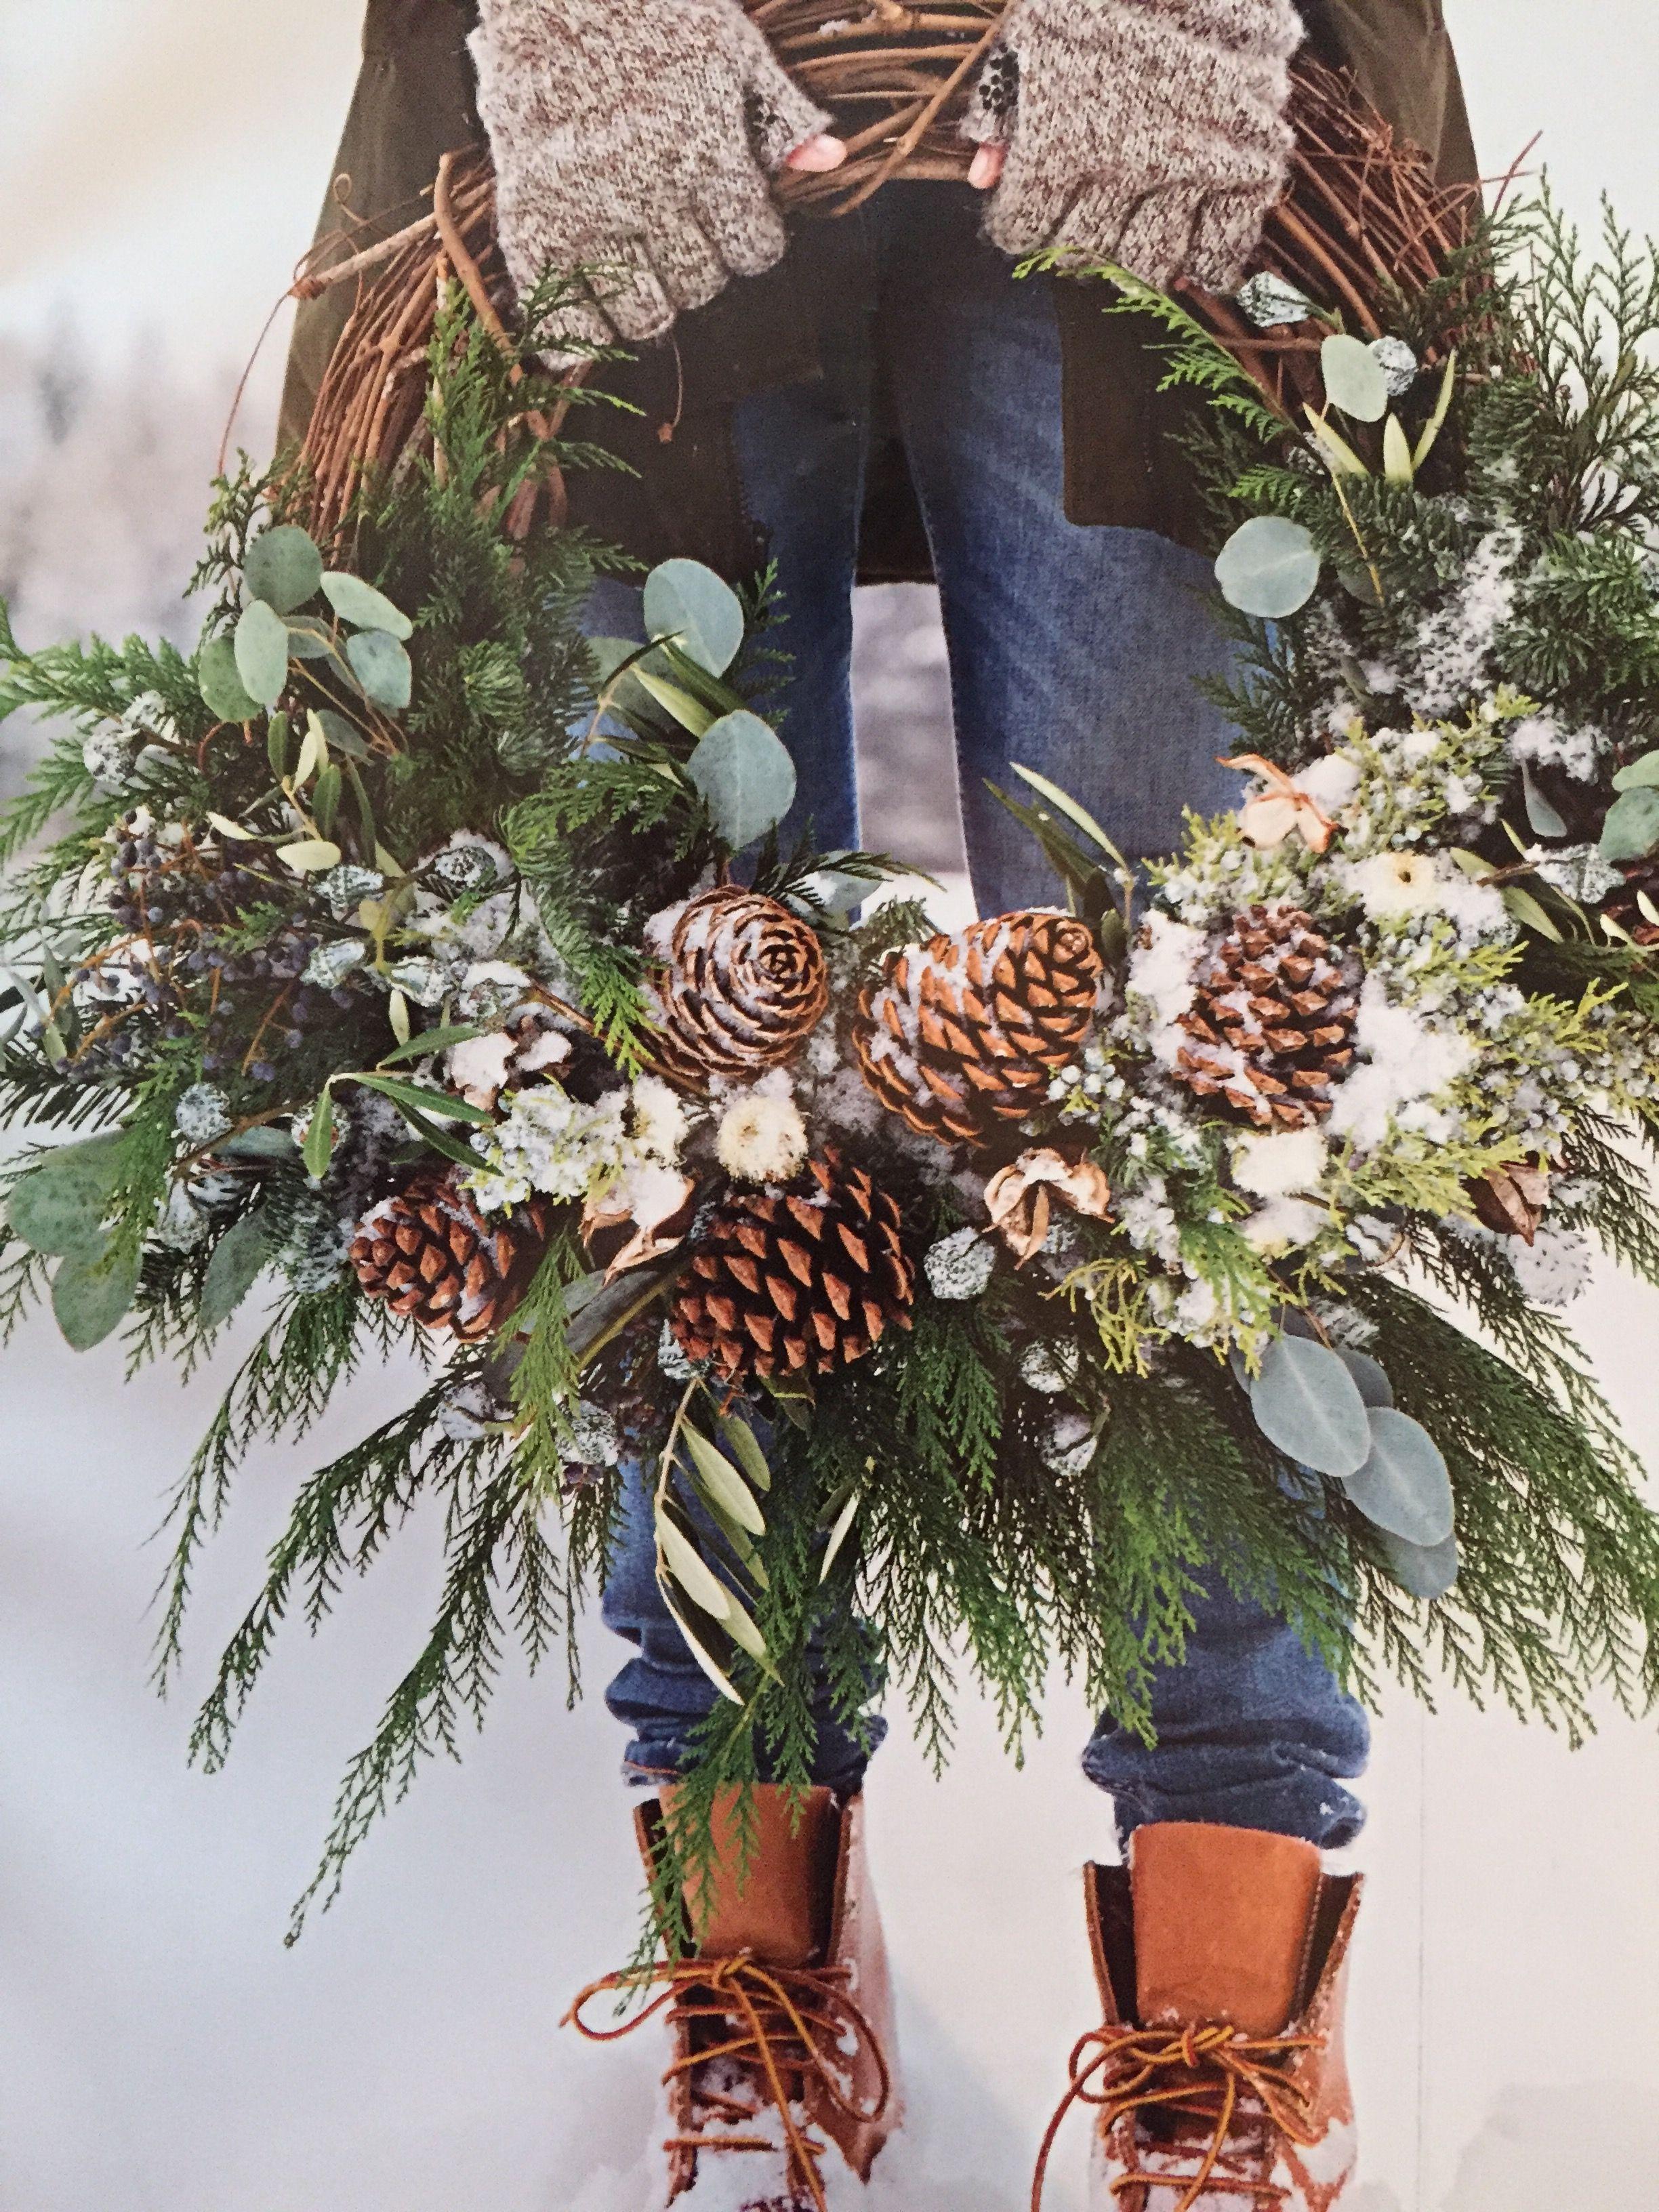 updated christmas wreath martha stewart december 2017 grapevine eucalyptus cedar pine cones. Black Bedroom Furniture Sets. Home Design Ideas